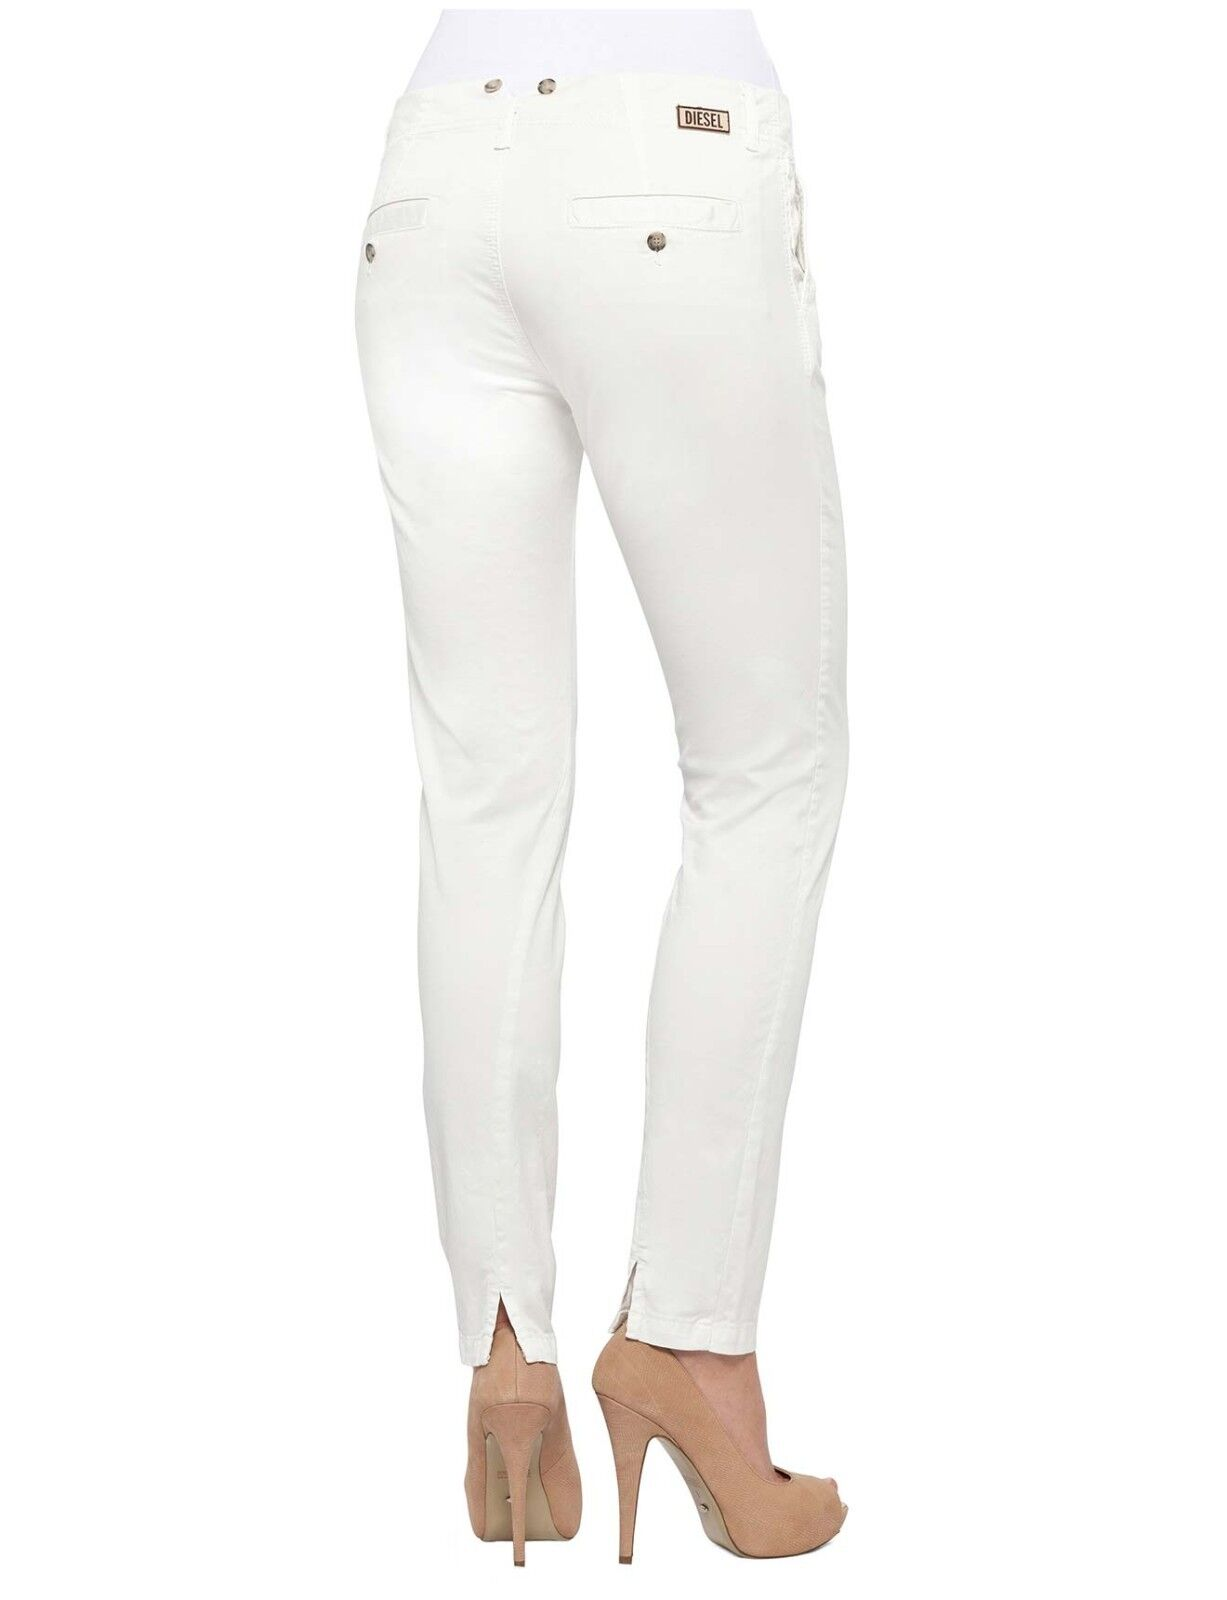 Diesel Jeans P-Detta-St Pantaloni Trousers Straight Leg Off White Pant 28 NWT